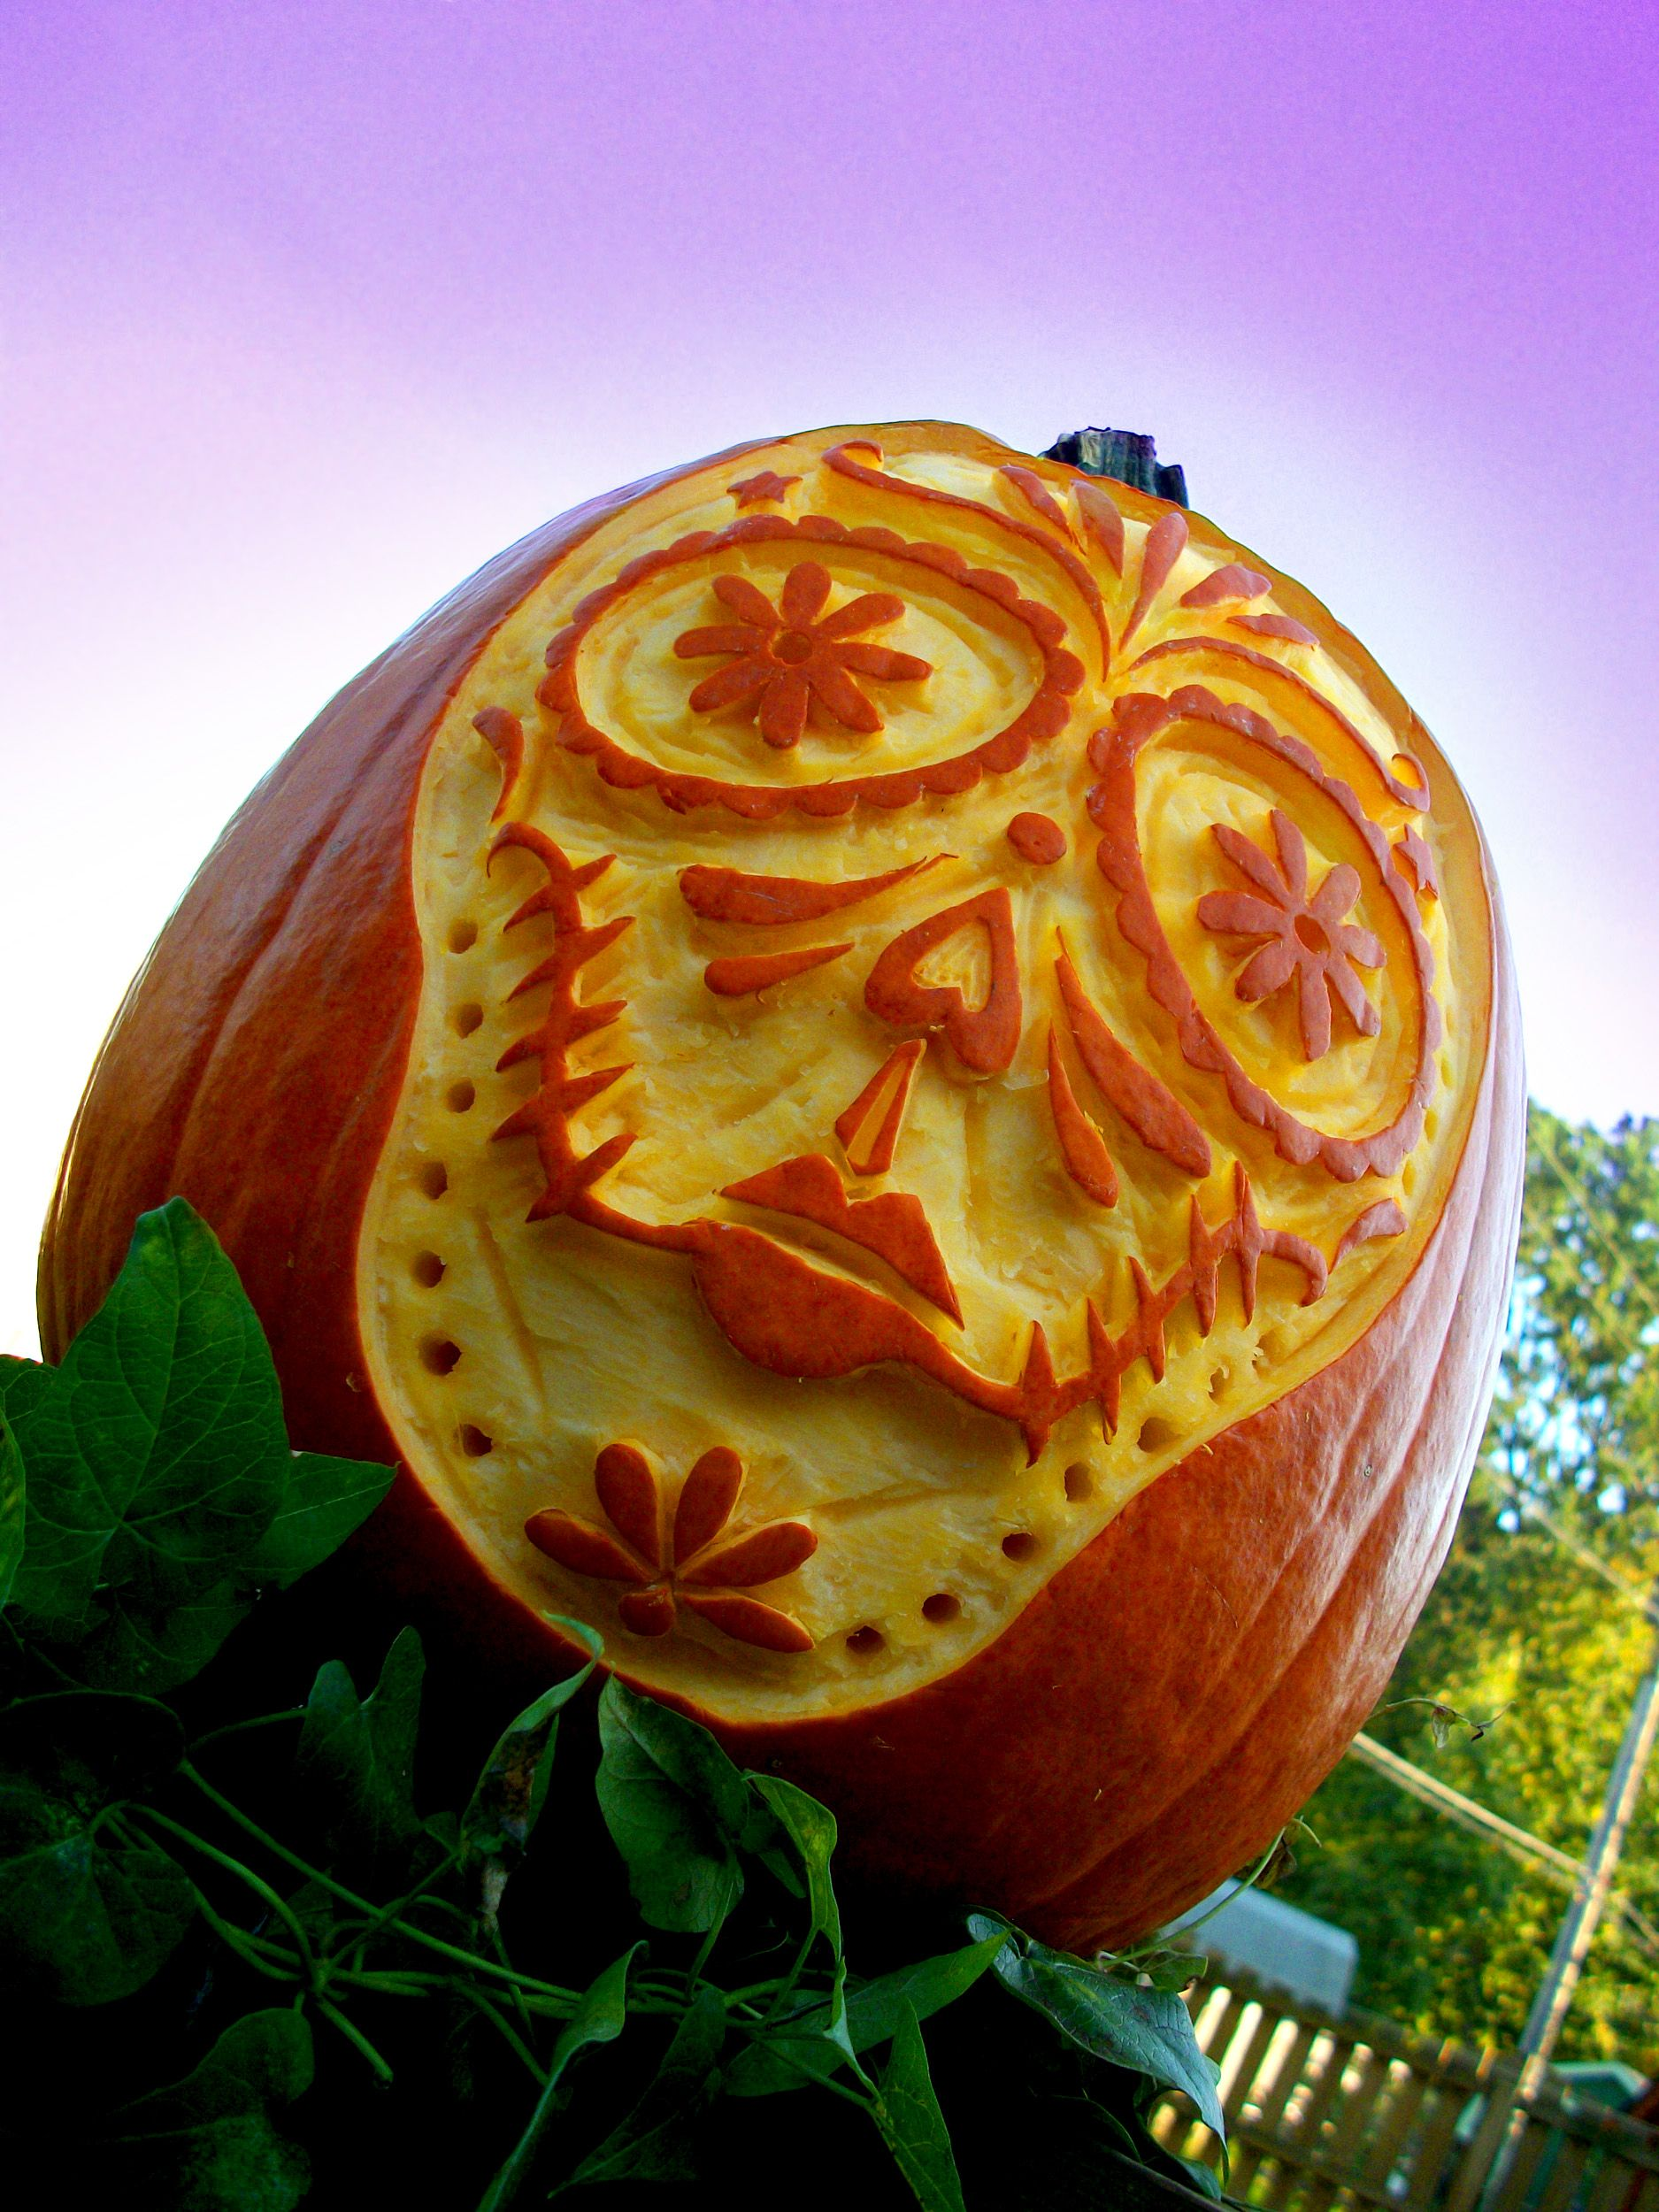 2Shea Creative Pumpkin Carving Templates Sugar Skull Pumpkin